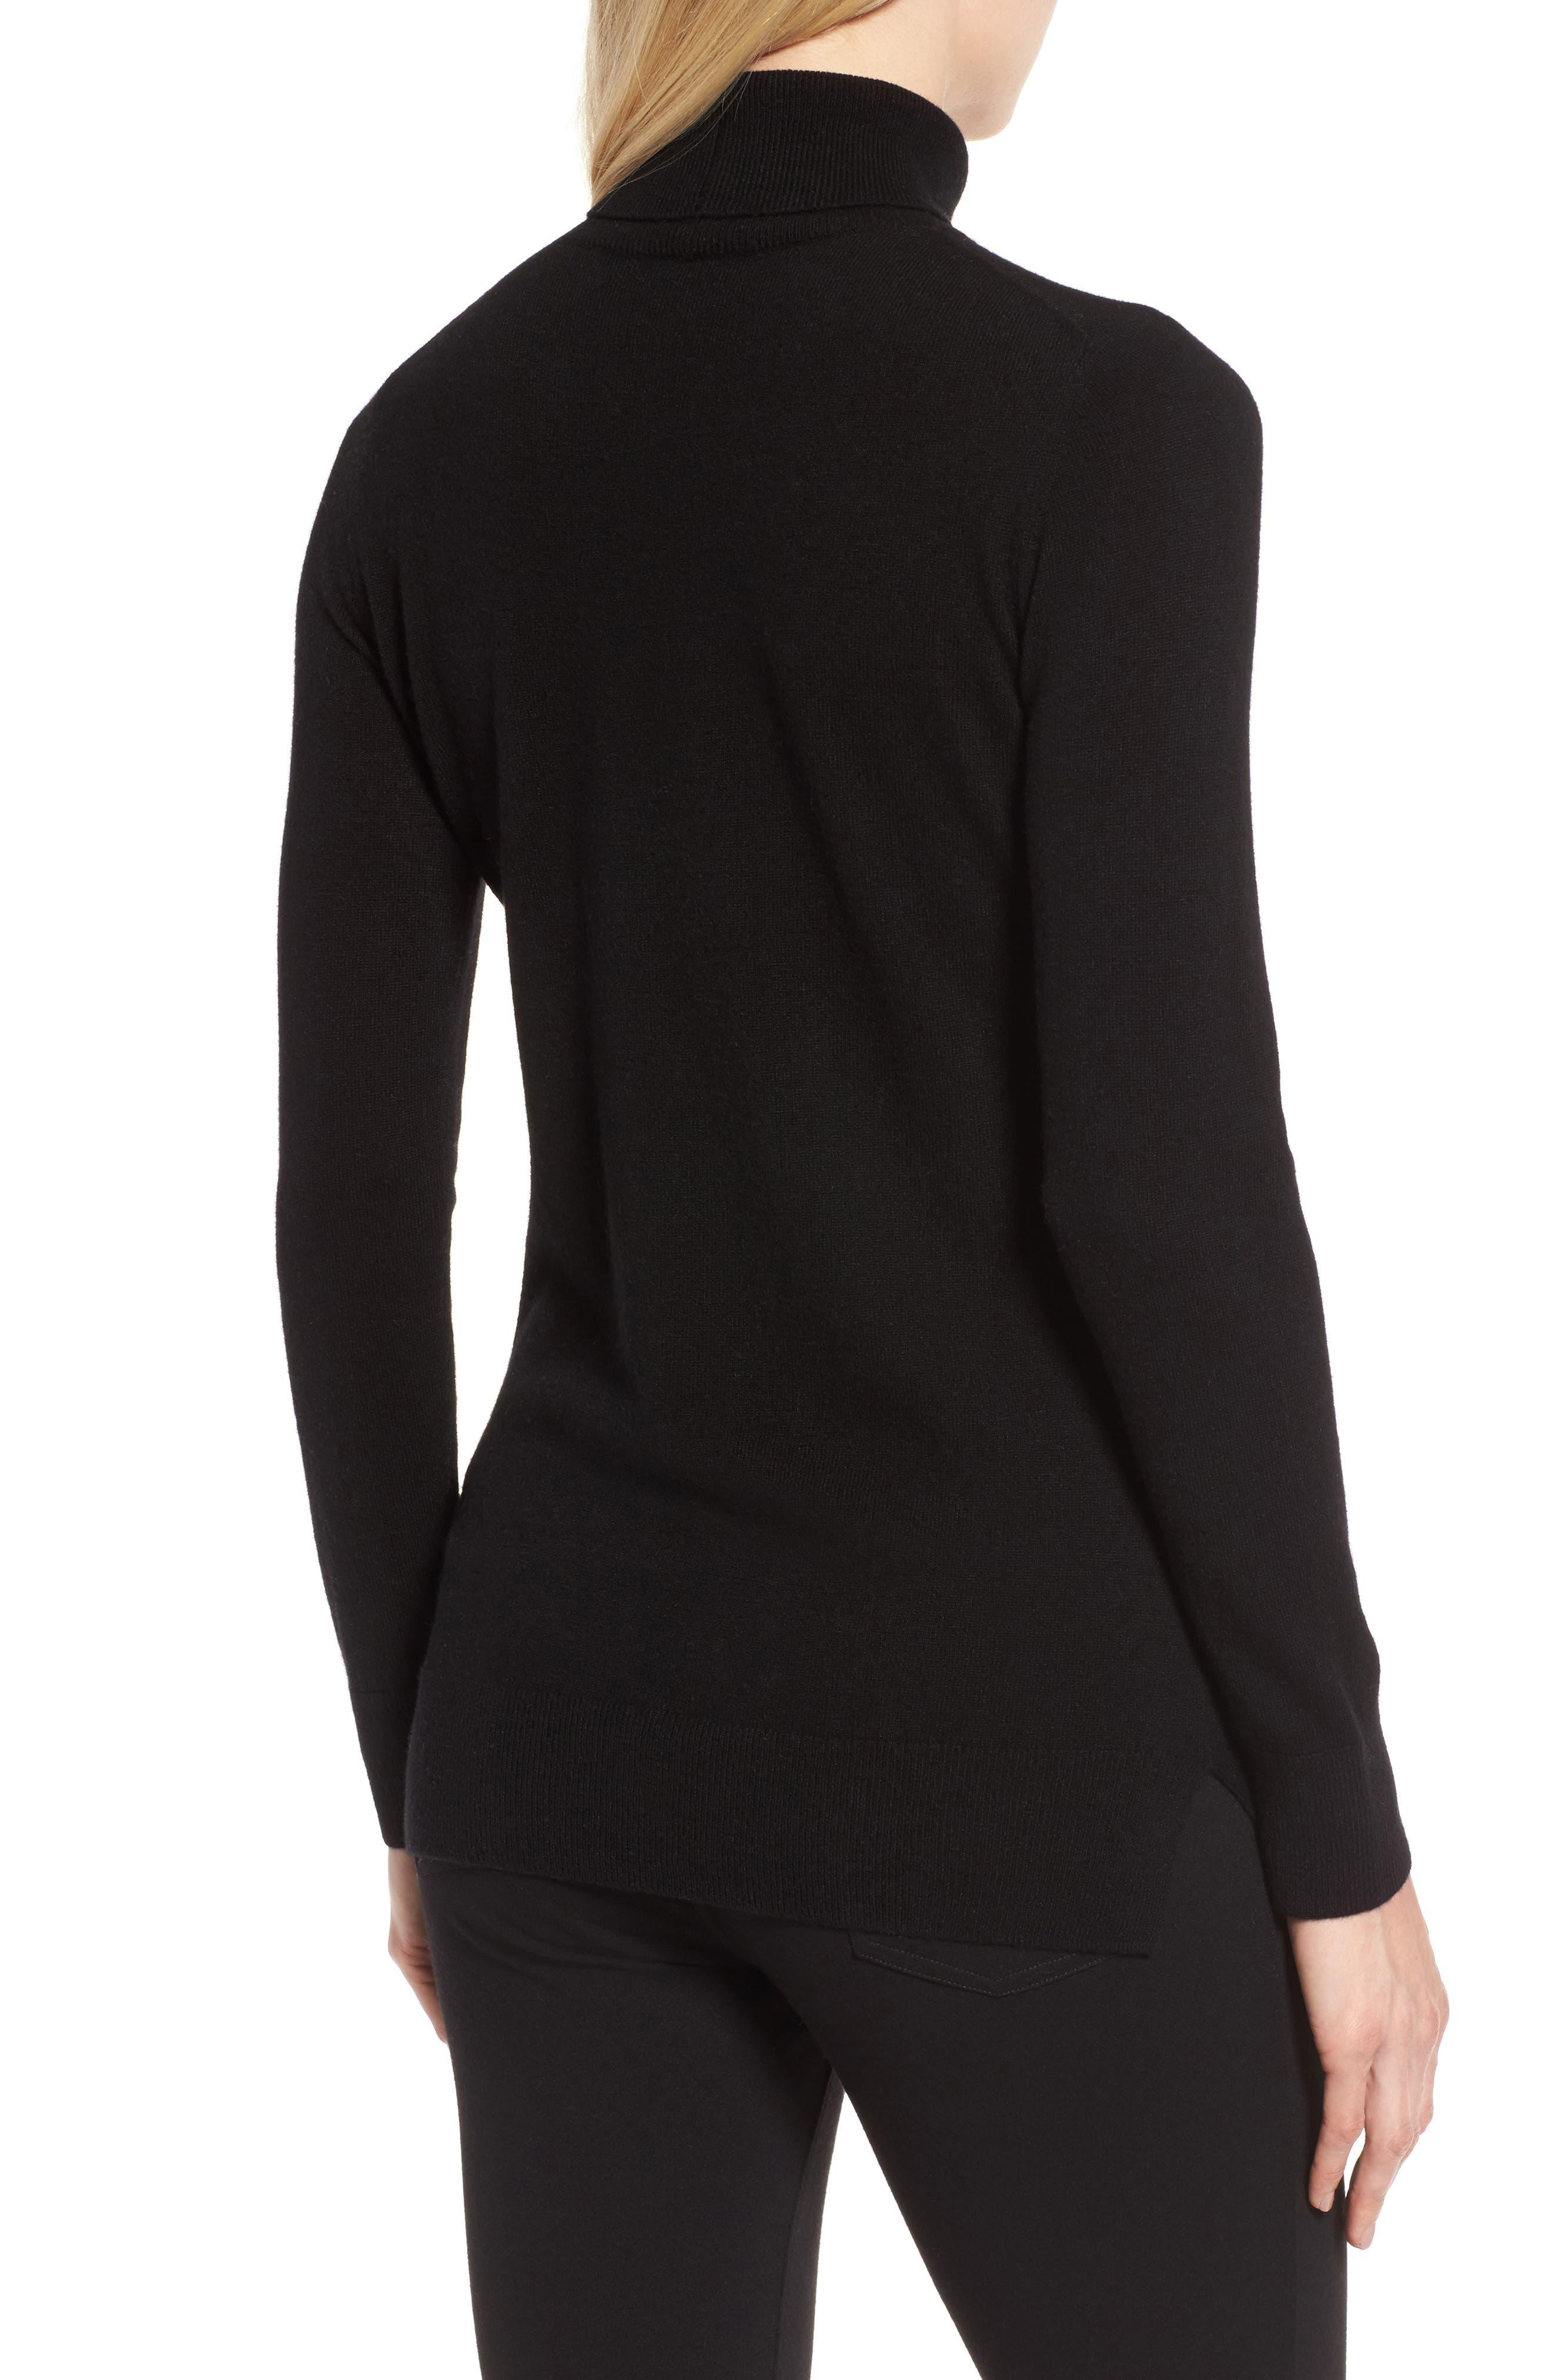 Turtleneck Cashmere Sweater,                             Alternate thumbnail 2, color,                             BLACK